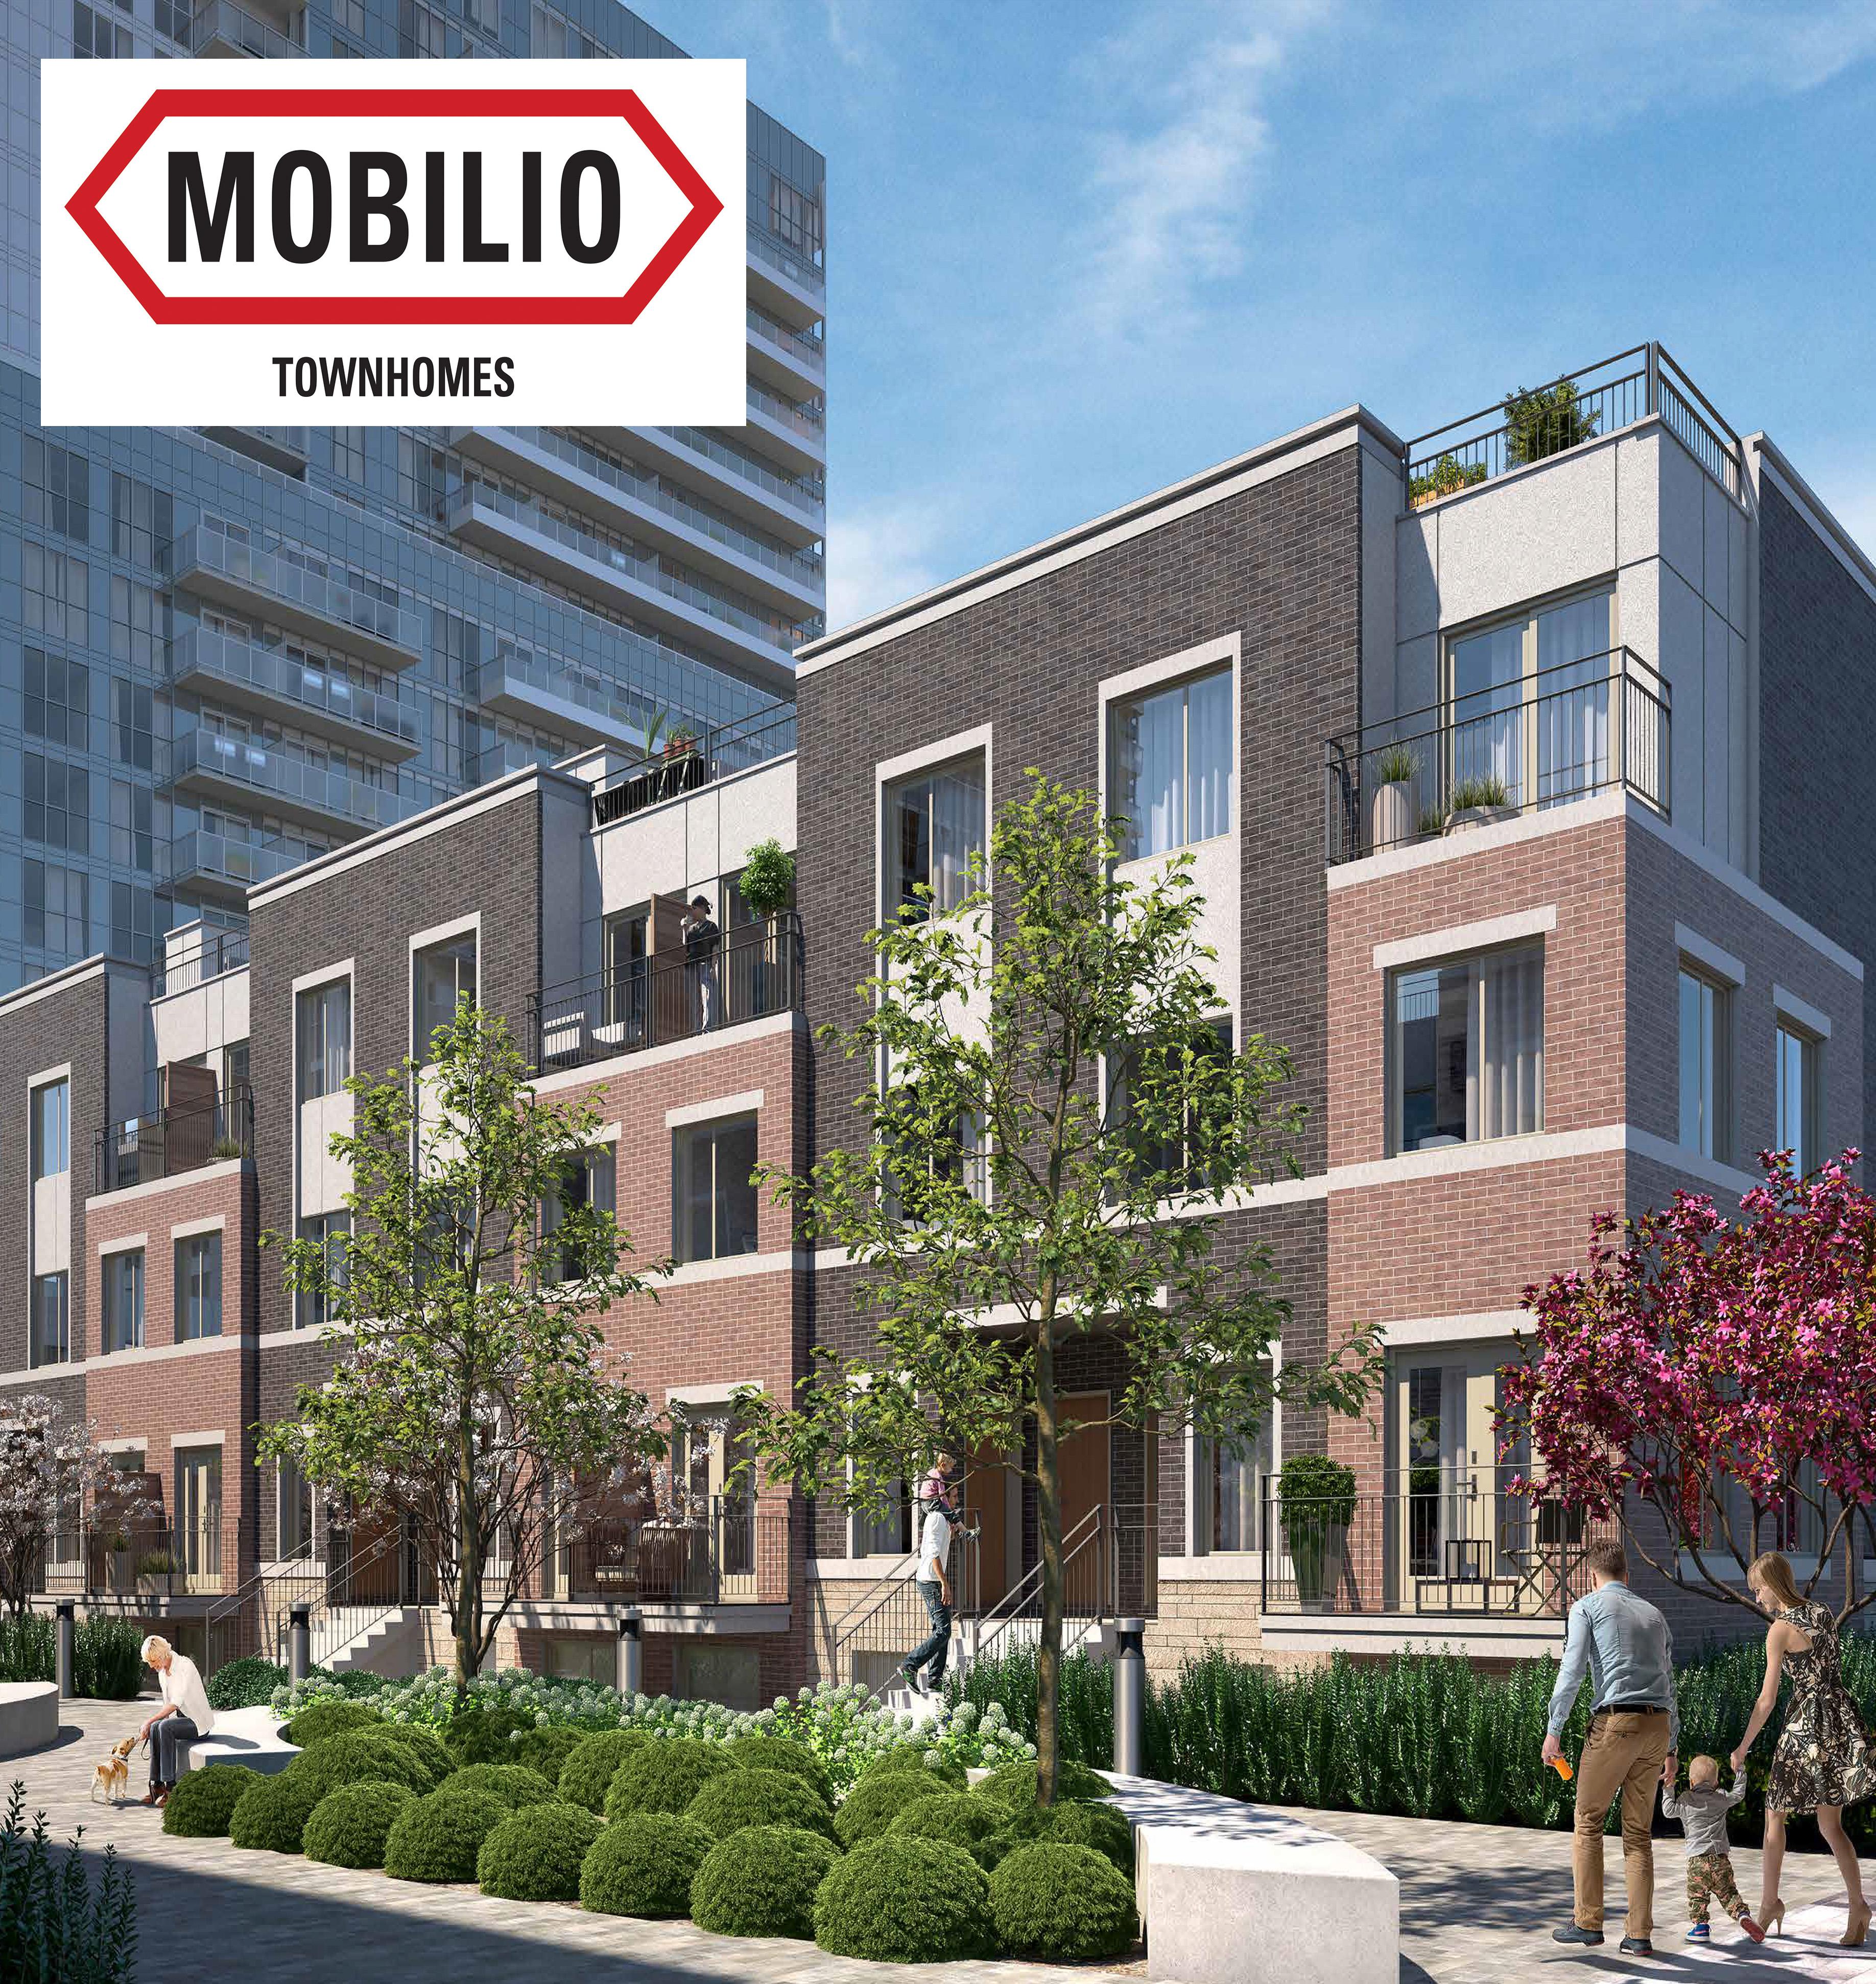 Mobilio Towns